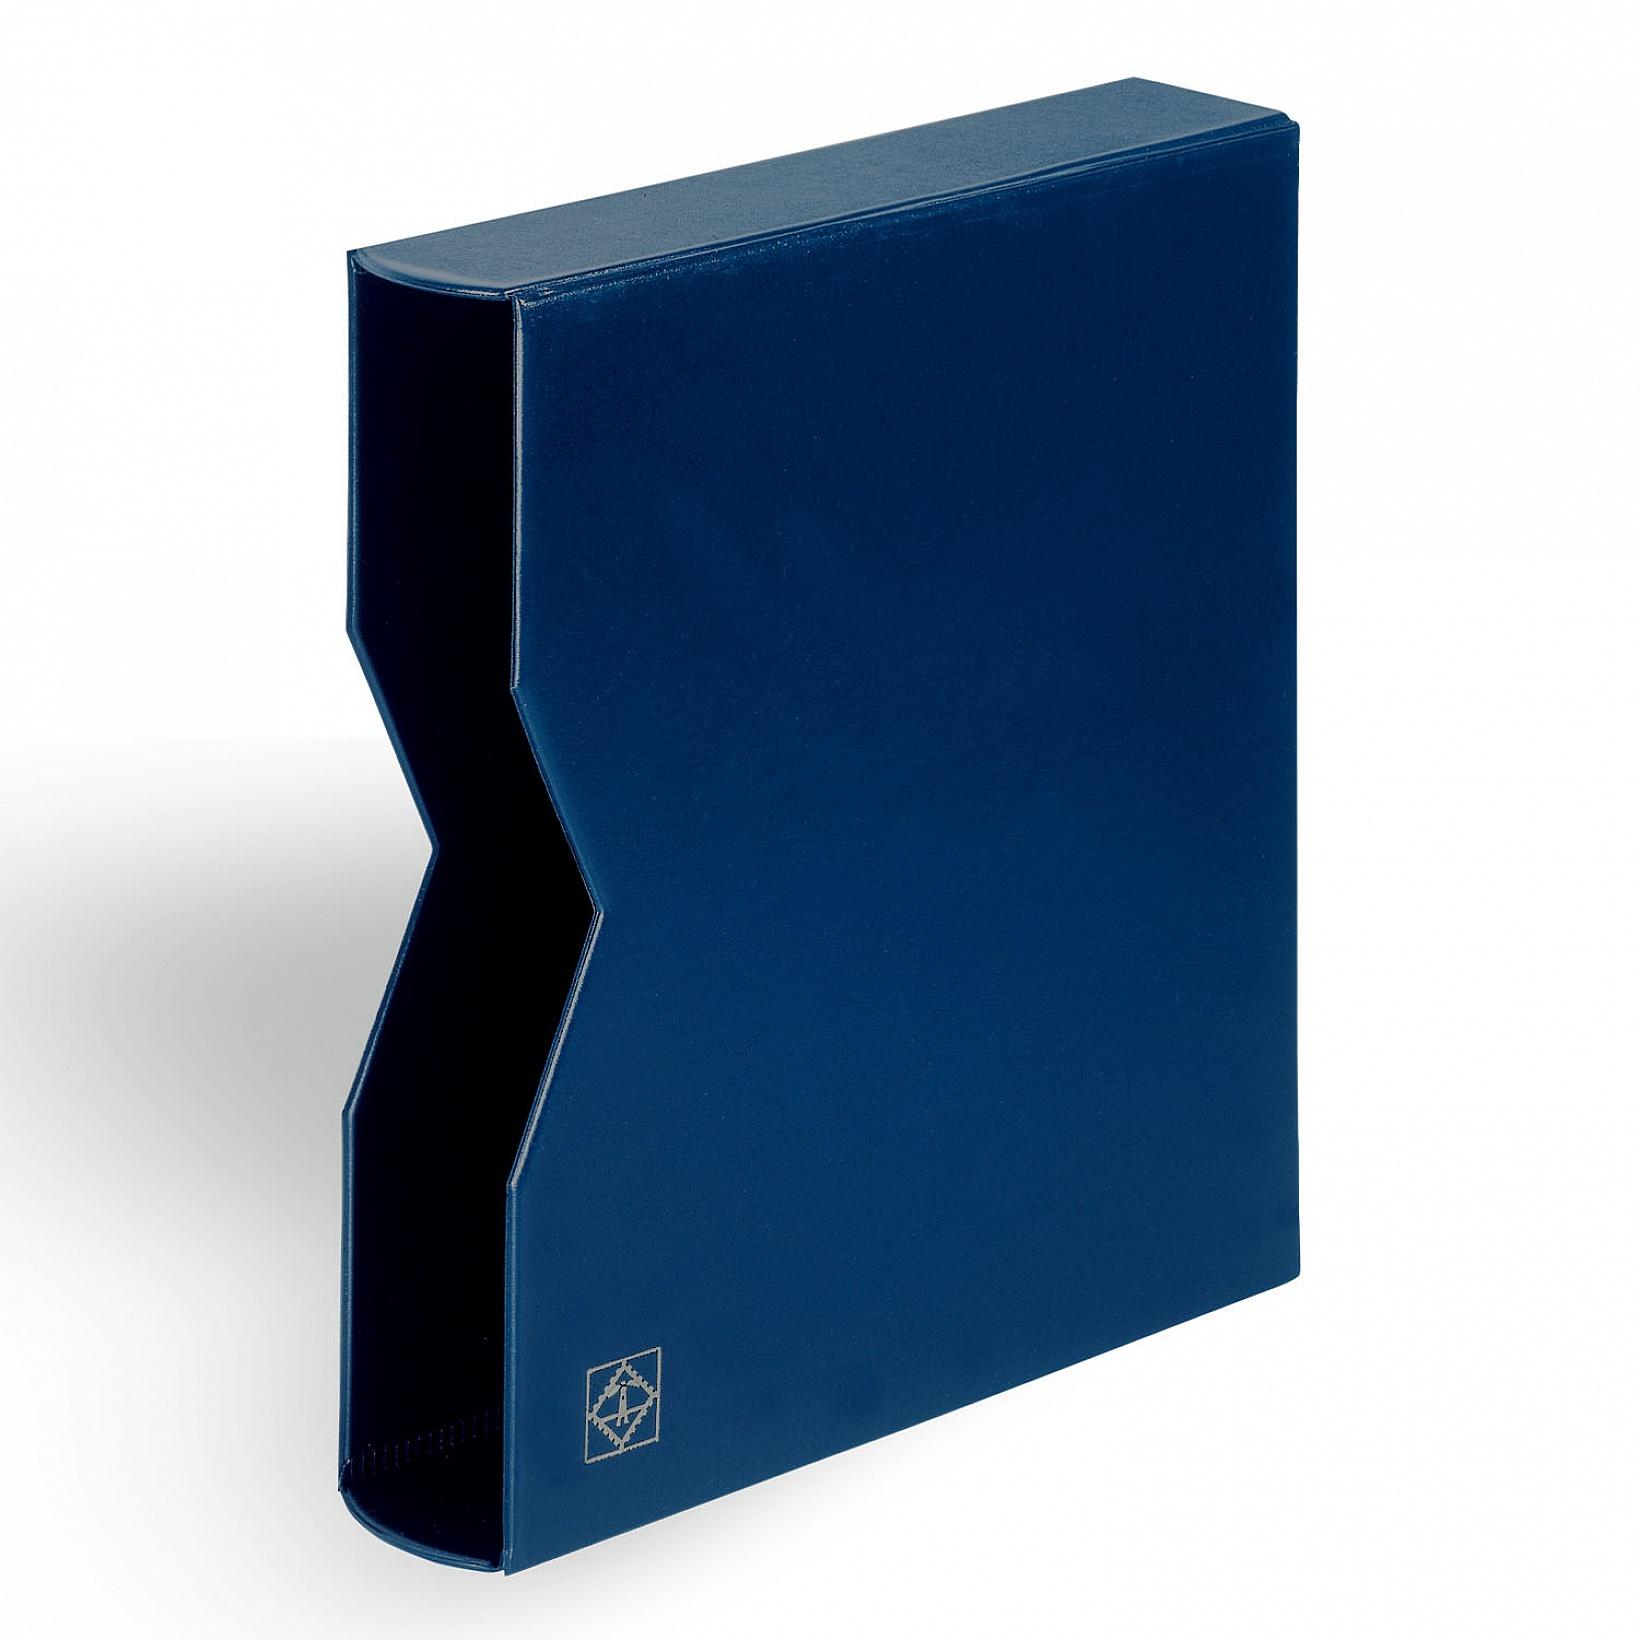 slipcase-for-ringbinder-optima-in-classic-design__1_